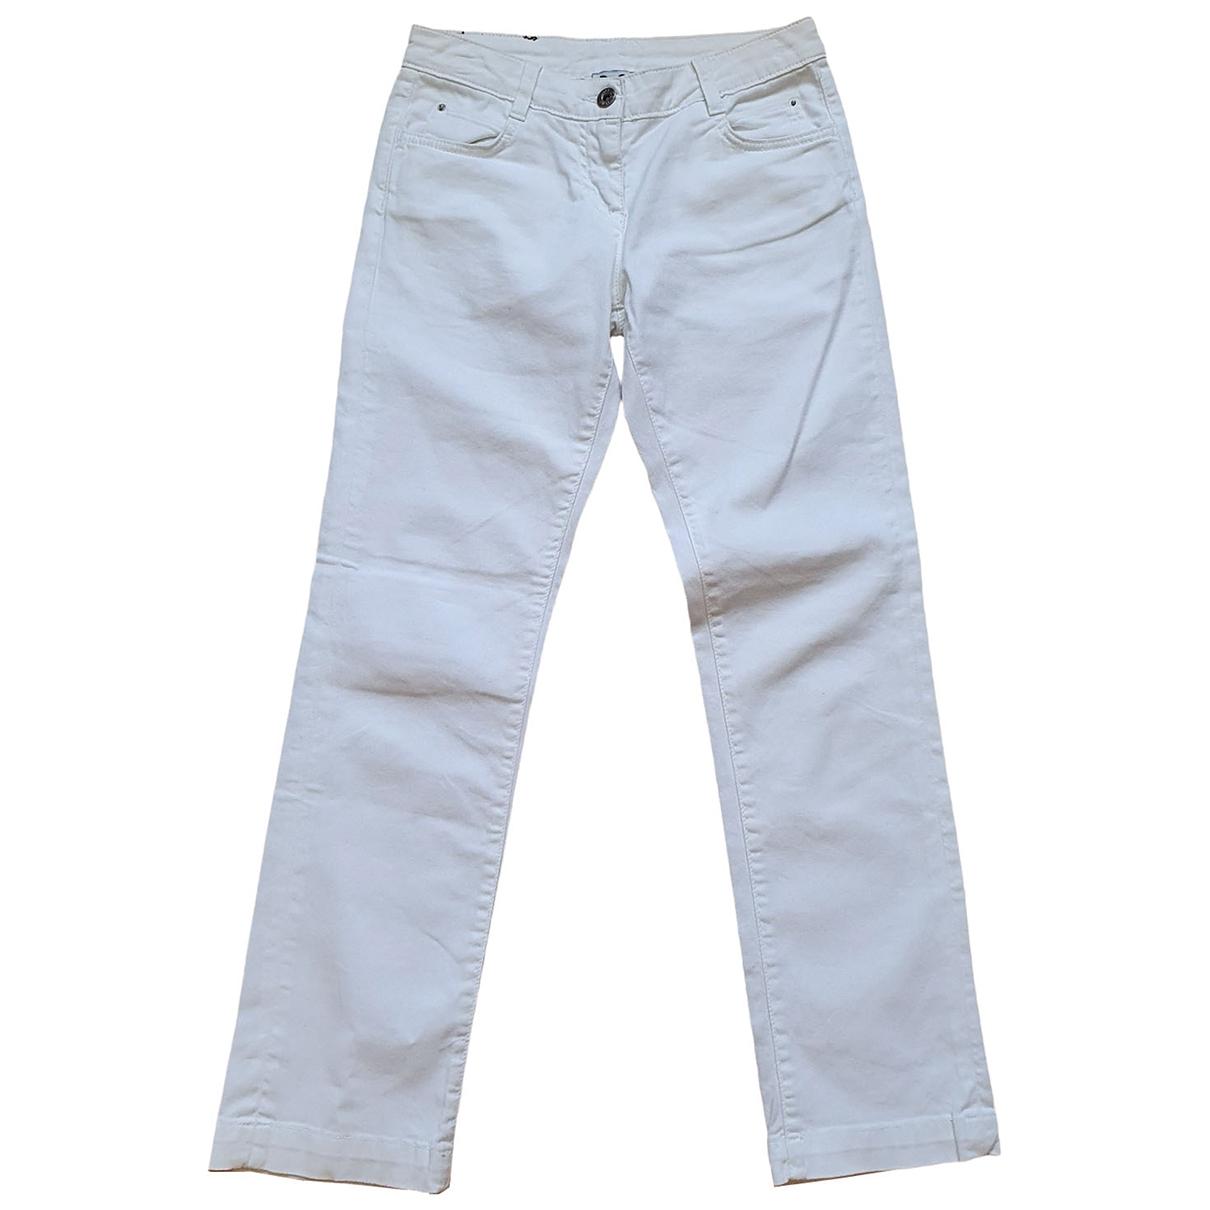 D&g - Pantalon   pour enfant en denim - blanc